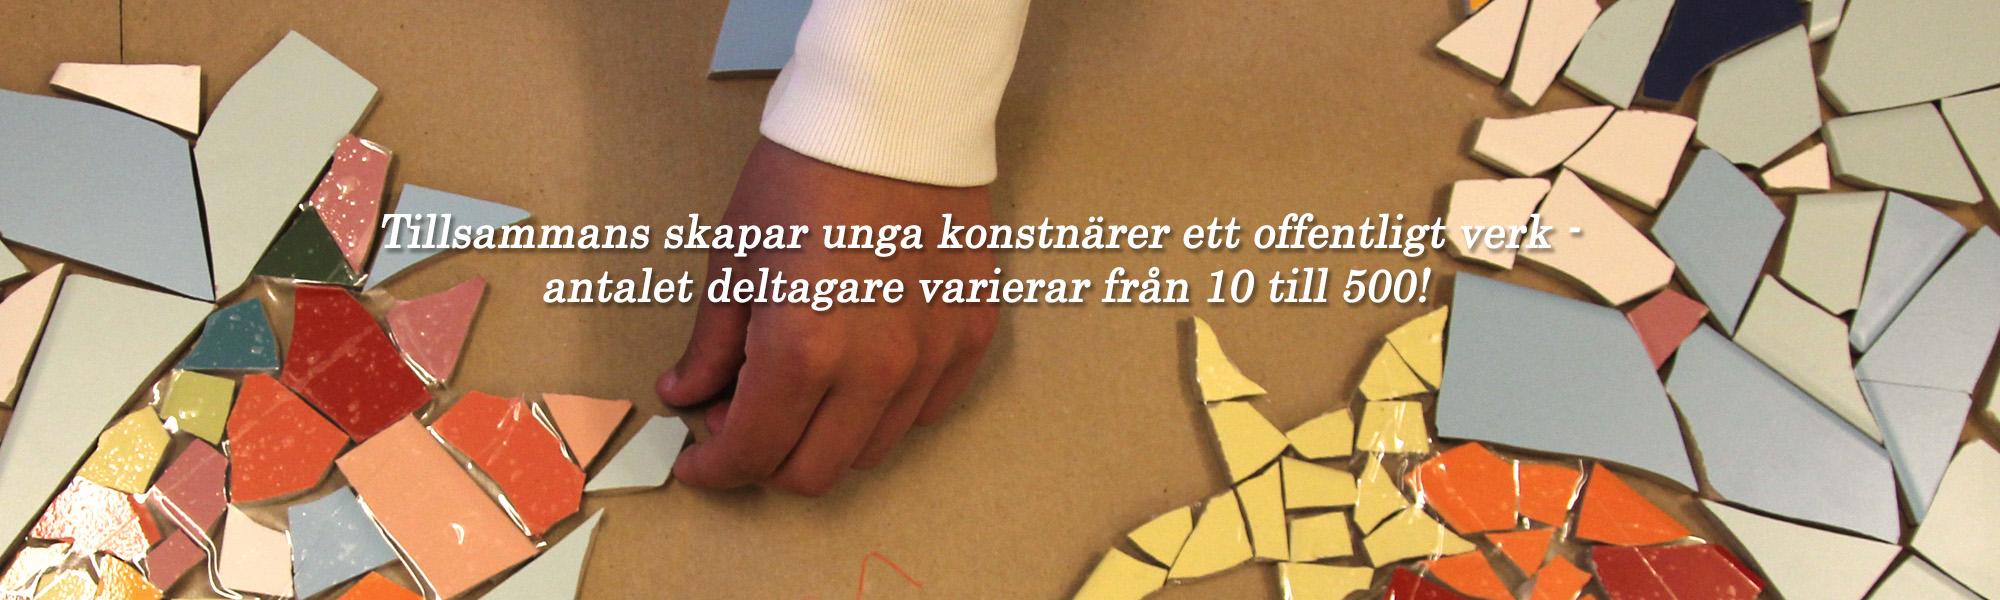 <a href='http://www.mosaika.se/meny/samarbeten/'></a>